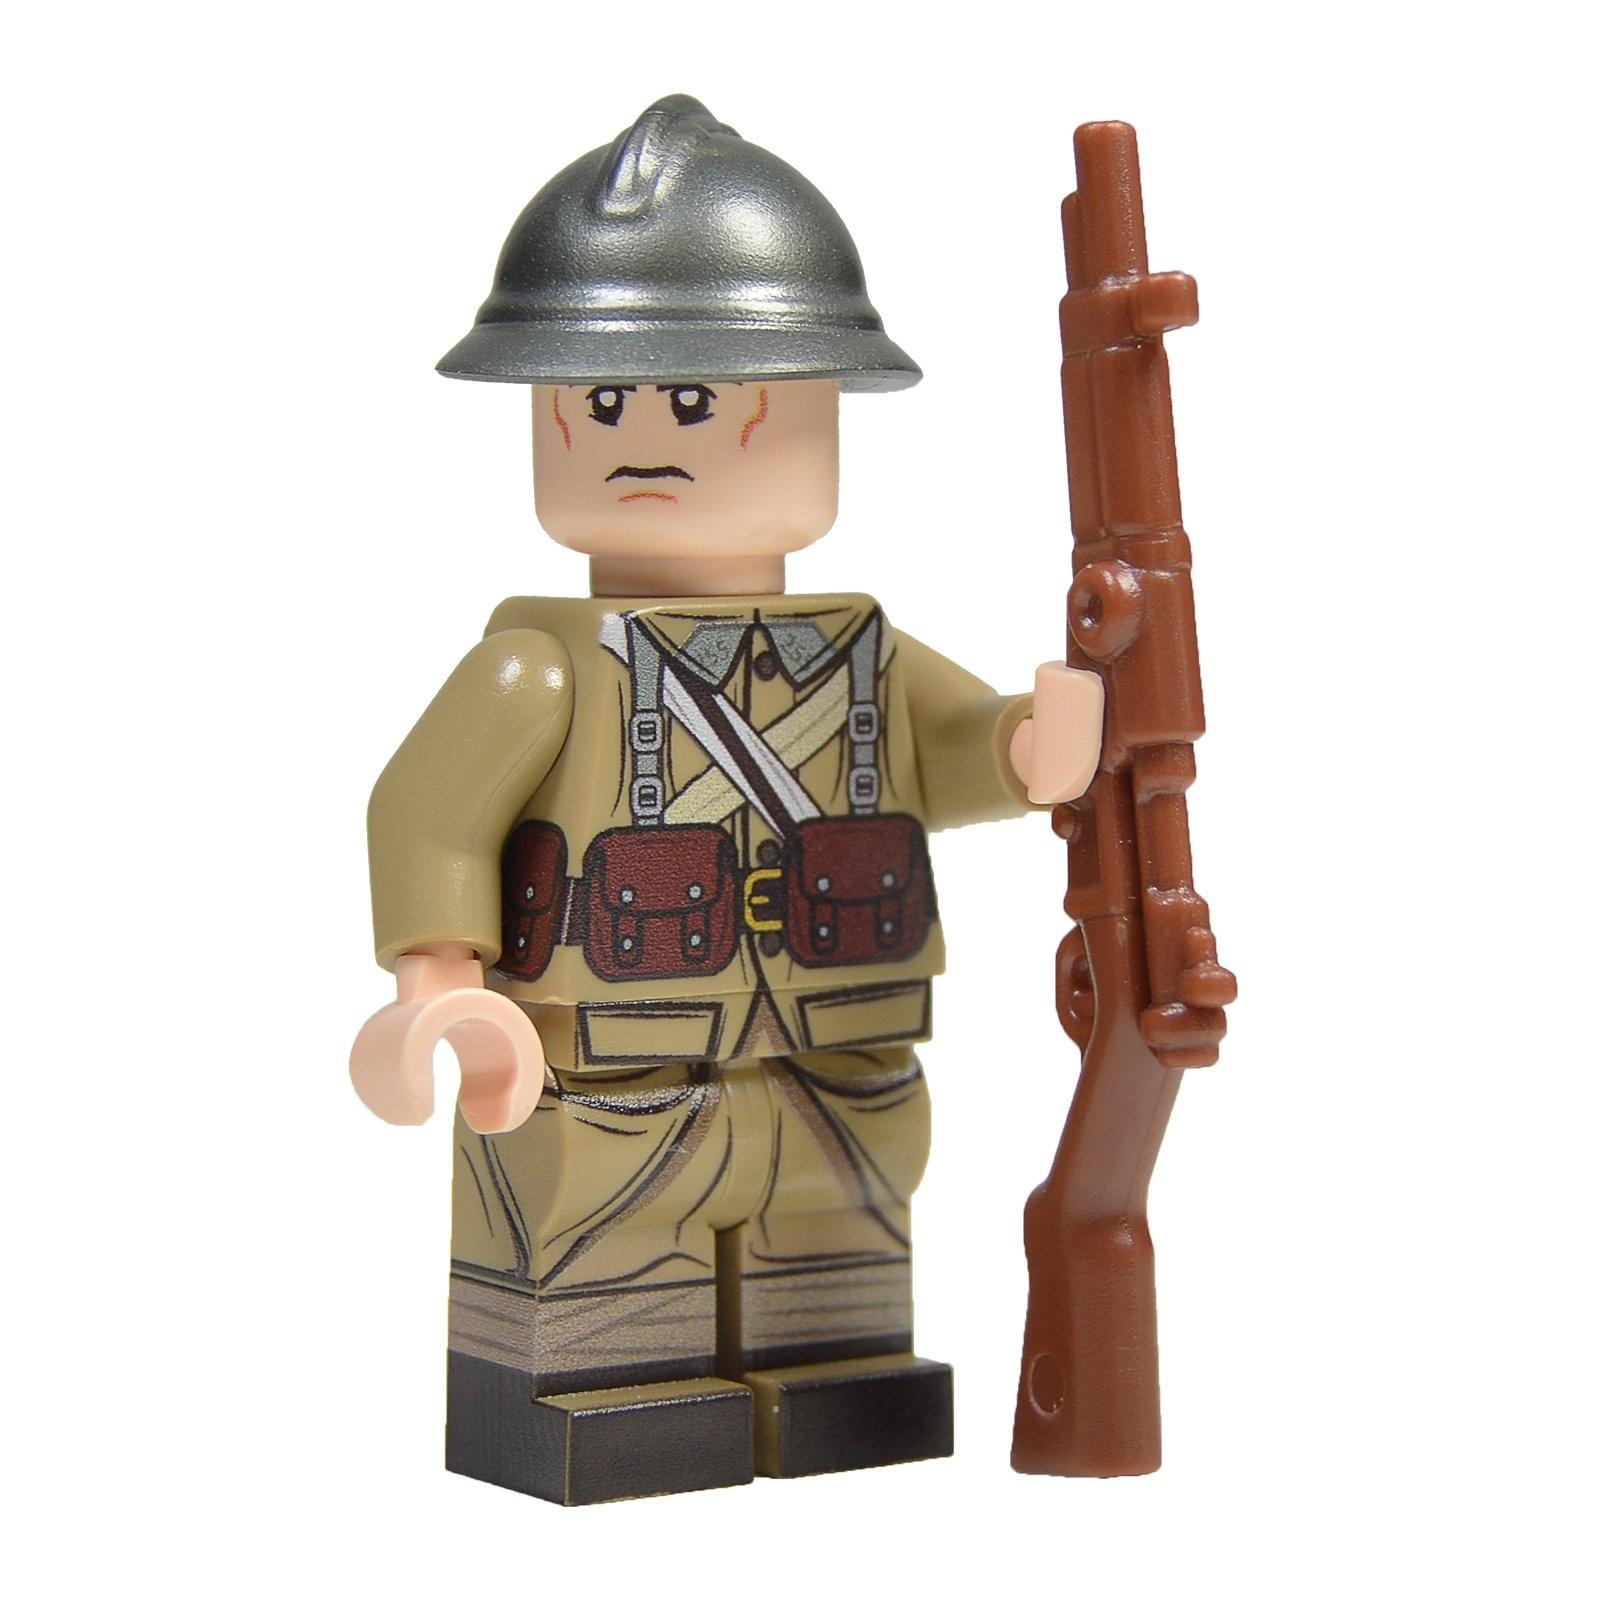 United Bricks WW2 French Soldier LEGO Minifigure Military